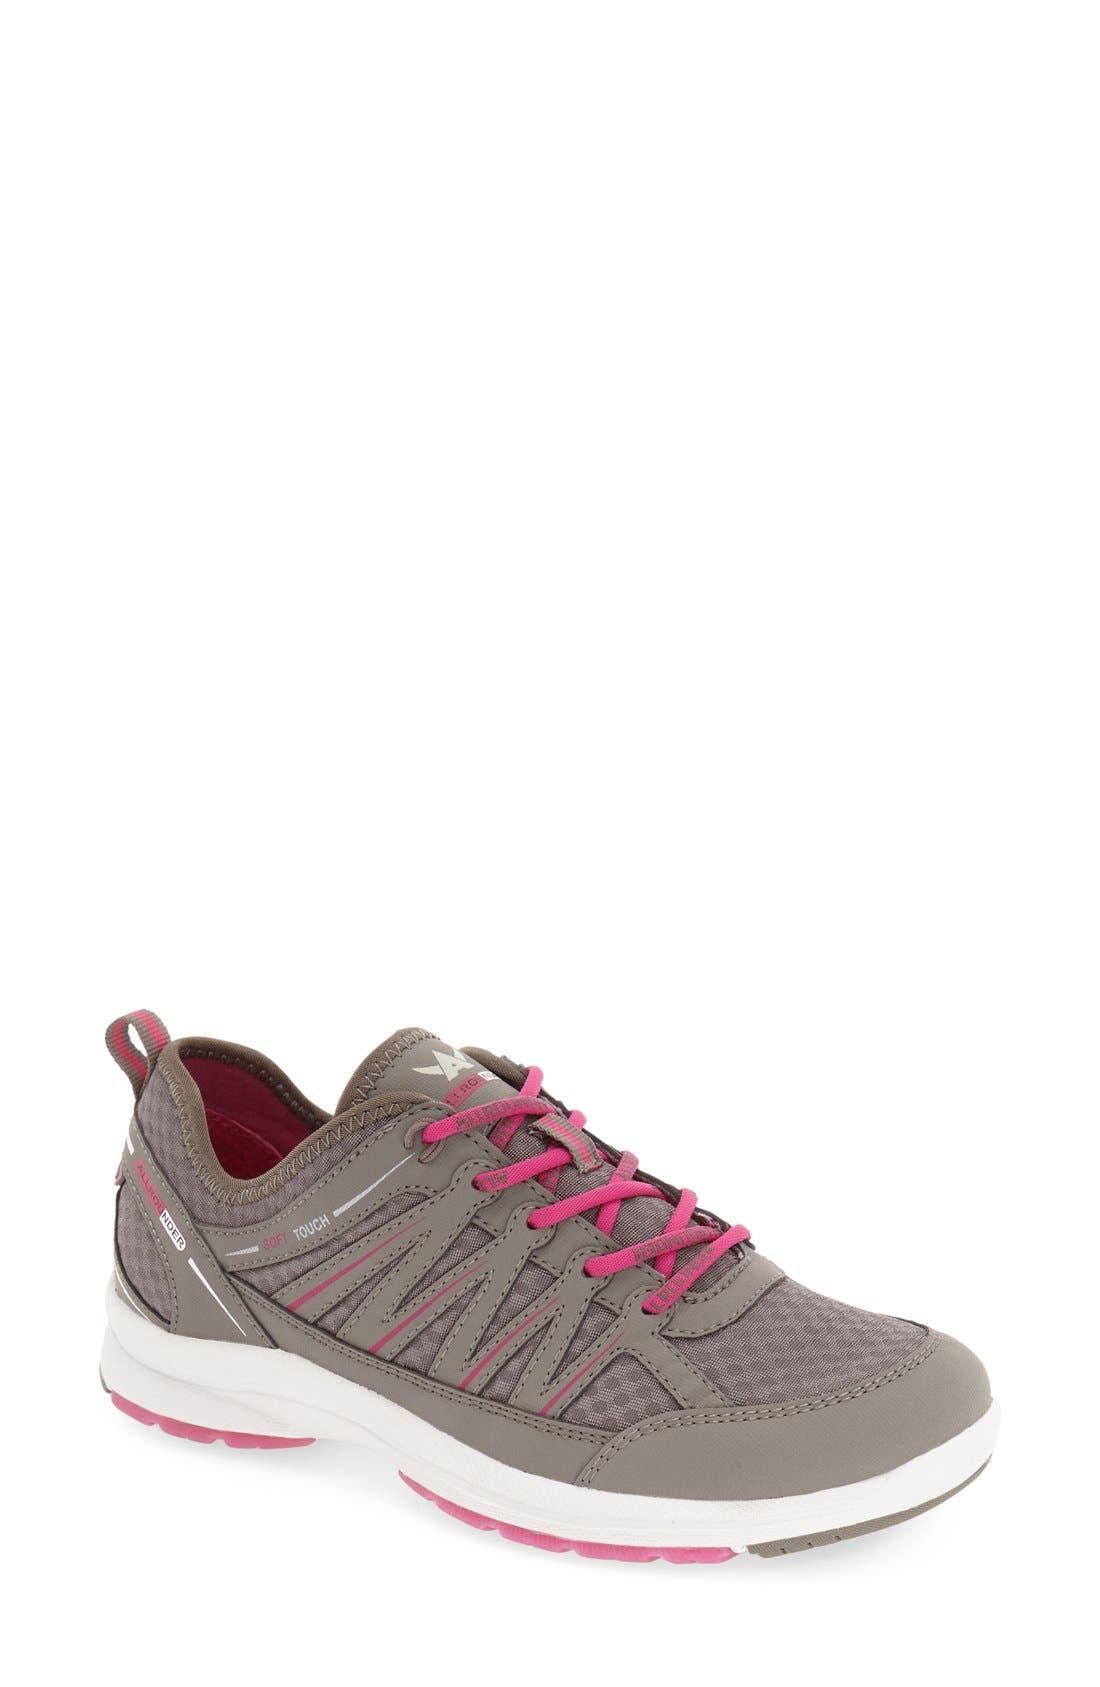 'Darina' Sneaker,                             Main thumbnail 1, color,                             036